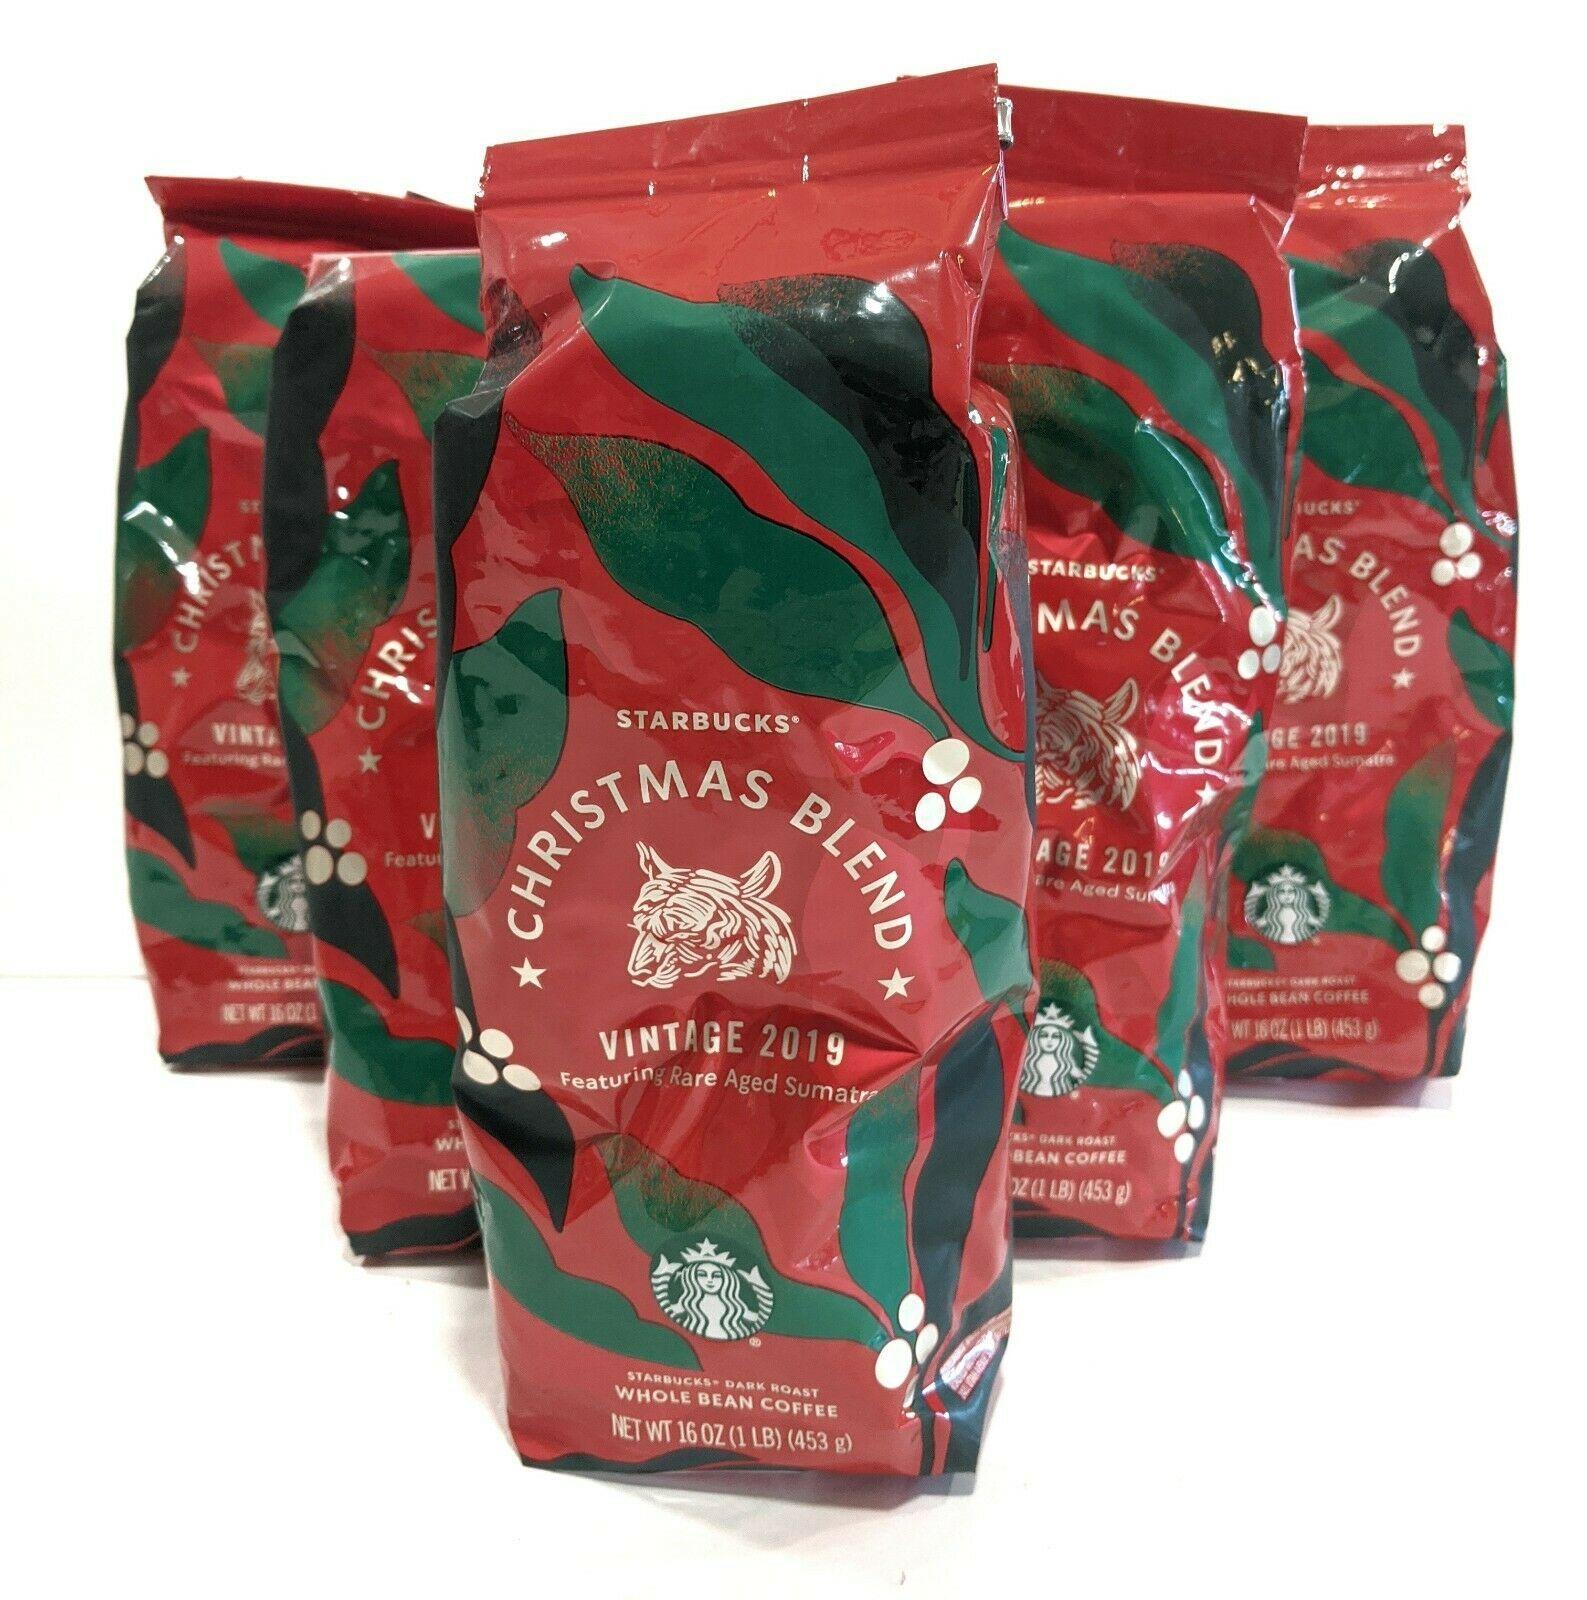 6 Bags Starbucks Whole Bean Coffee CHRISTMAS BLEND Vintage 2019 1